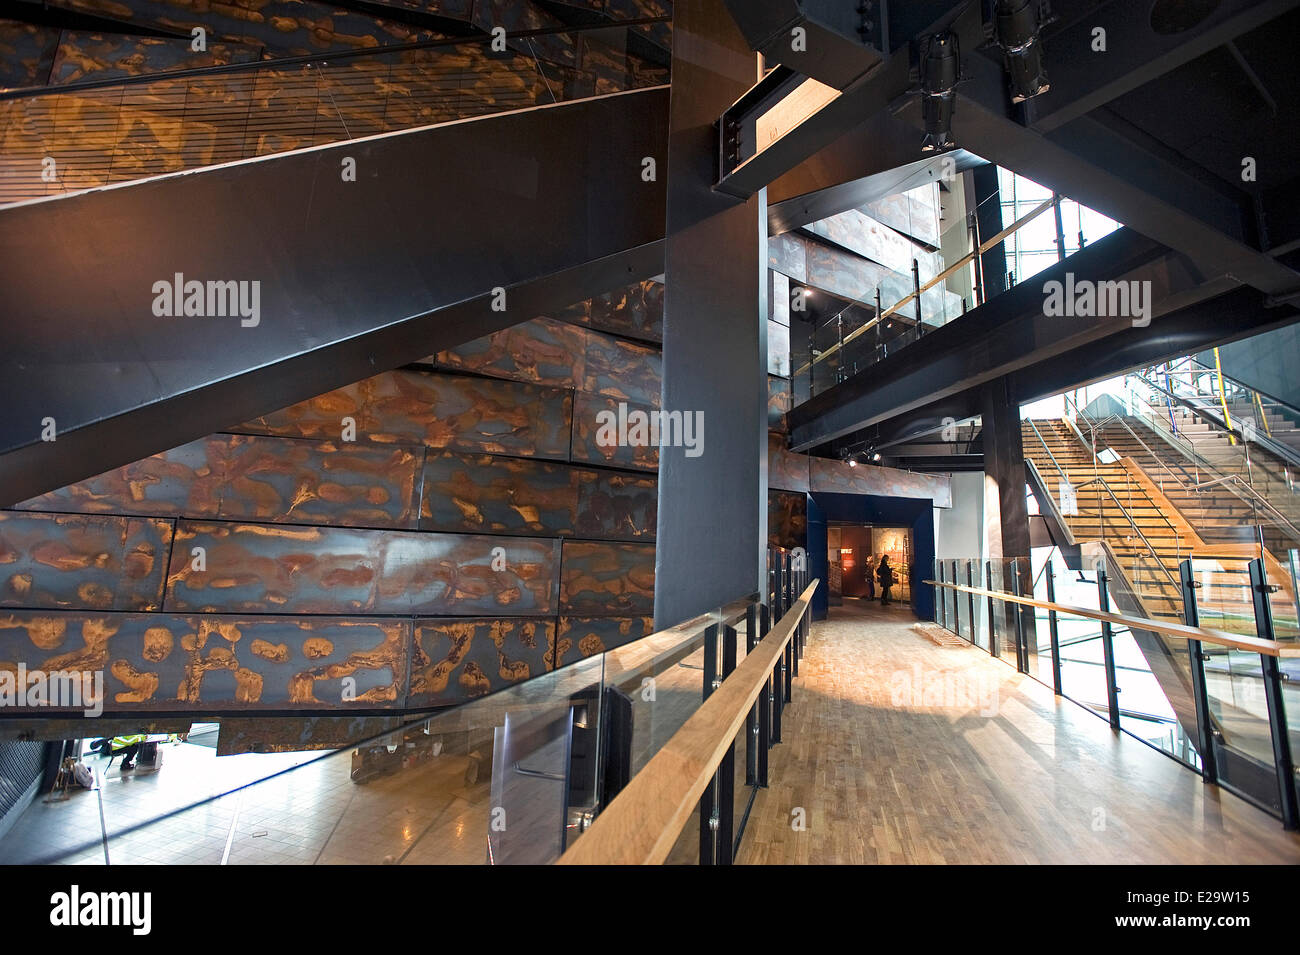 United Kingdom, Northern Ireland, Belfast, the Titanic Belfast museum - Stock Image